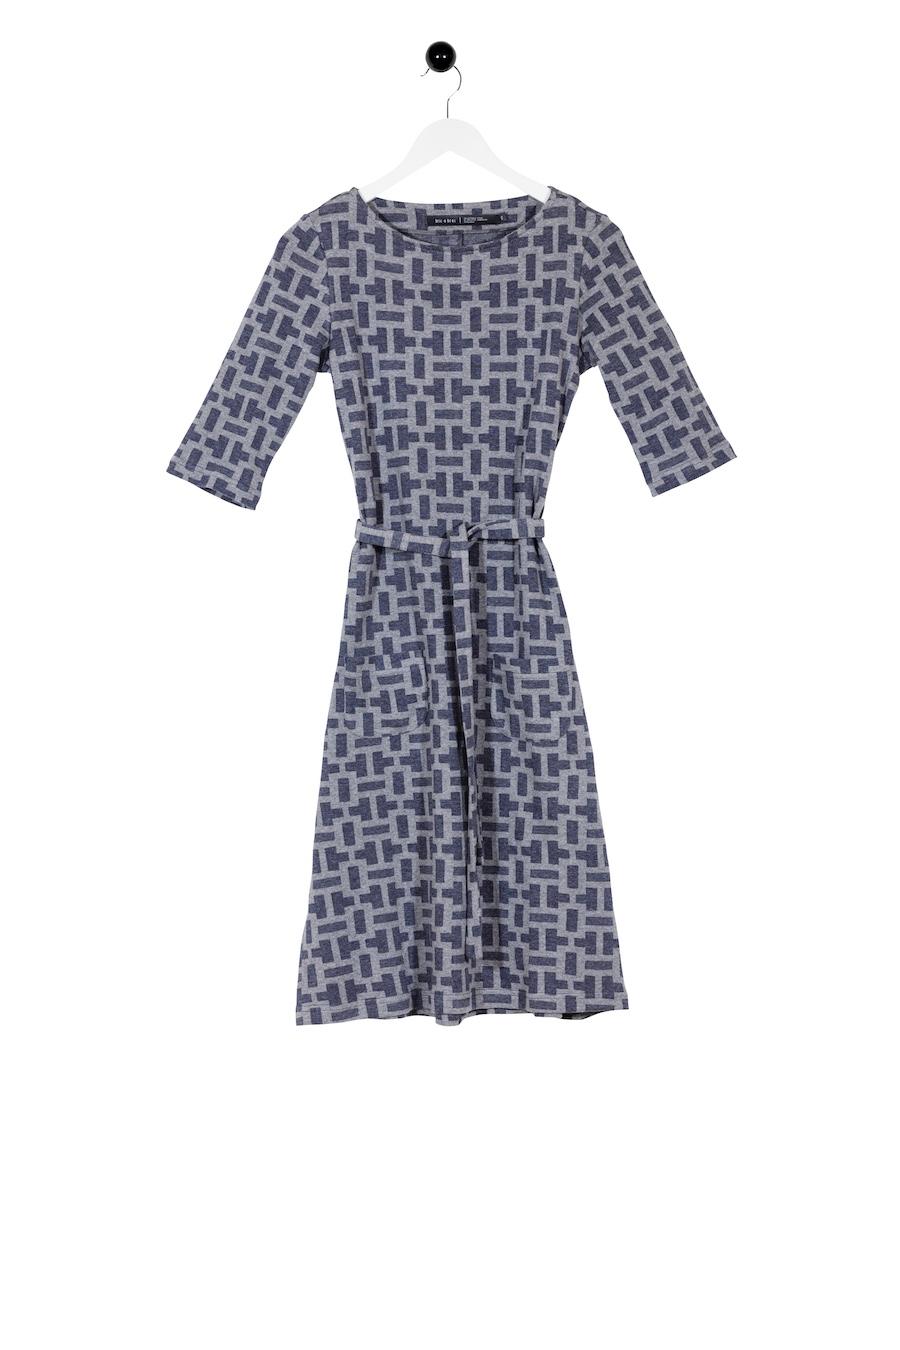 Dalby Dress